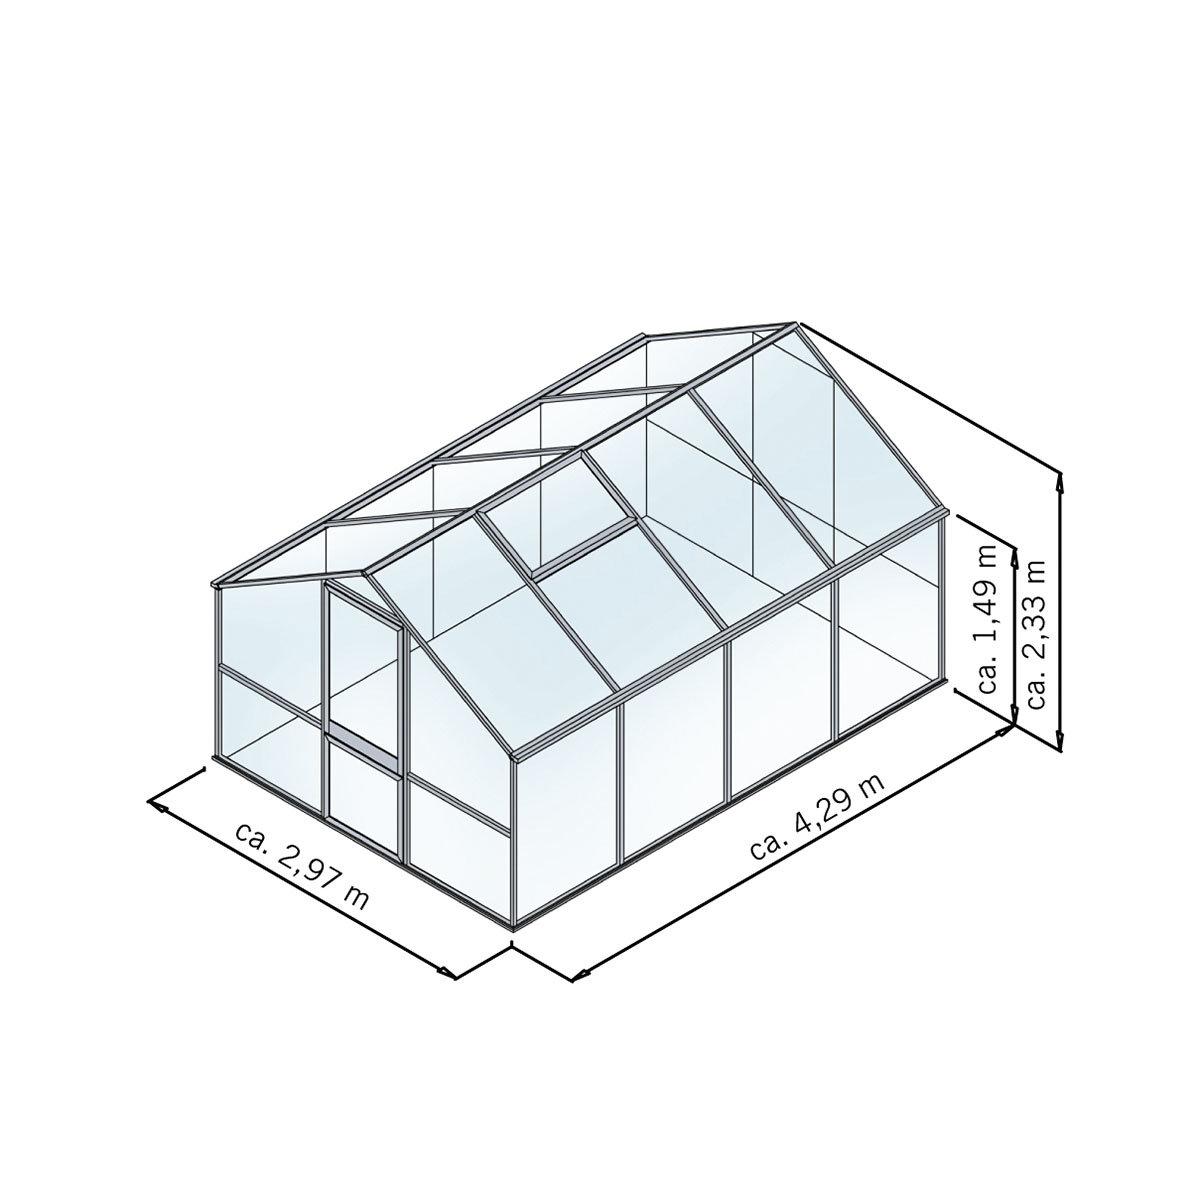 Gewächshaus Tulpe IV 297 x 429 cm, anthrazit-grau | #2